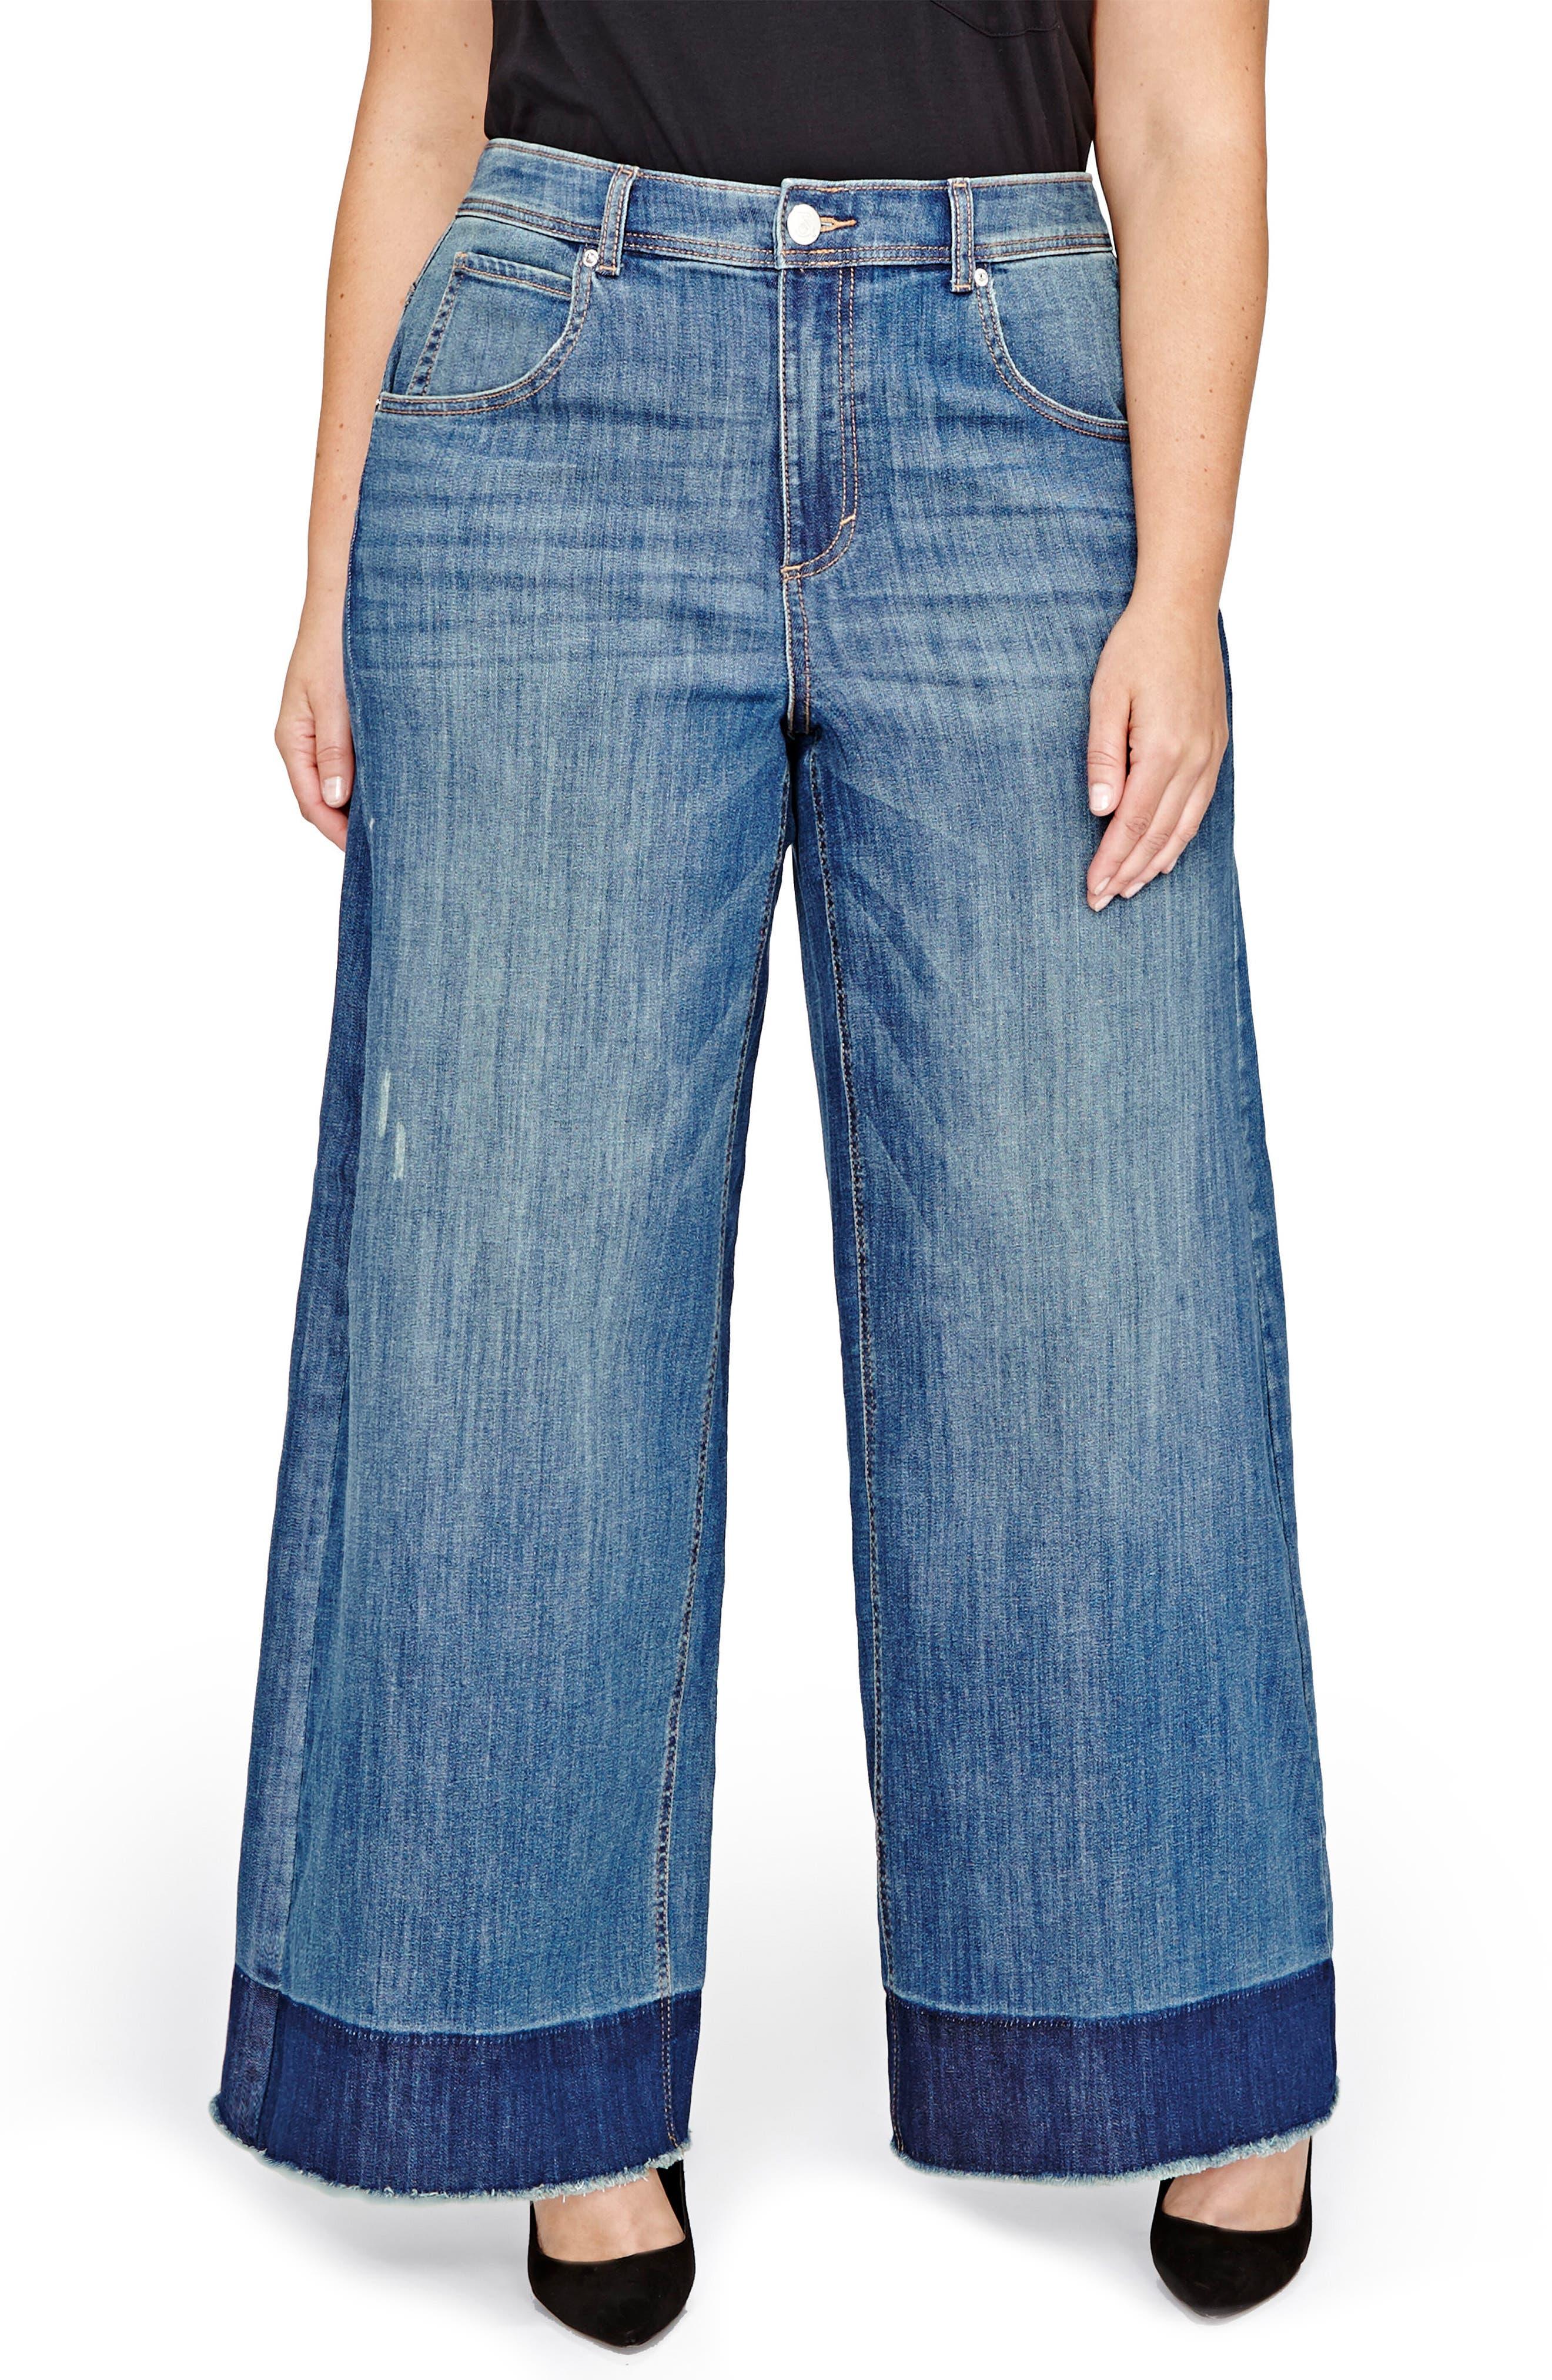 Jordyn Woods High Waist Wide Leg Jeans,                             Main thumbnail 1, color,                             Medium Wash Denim